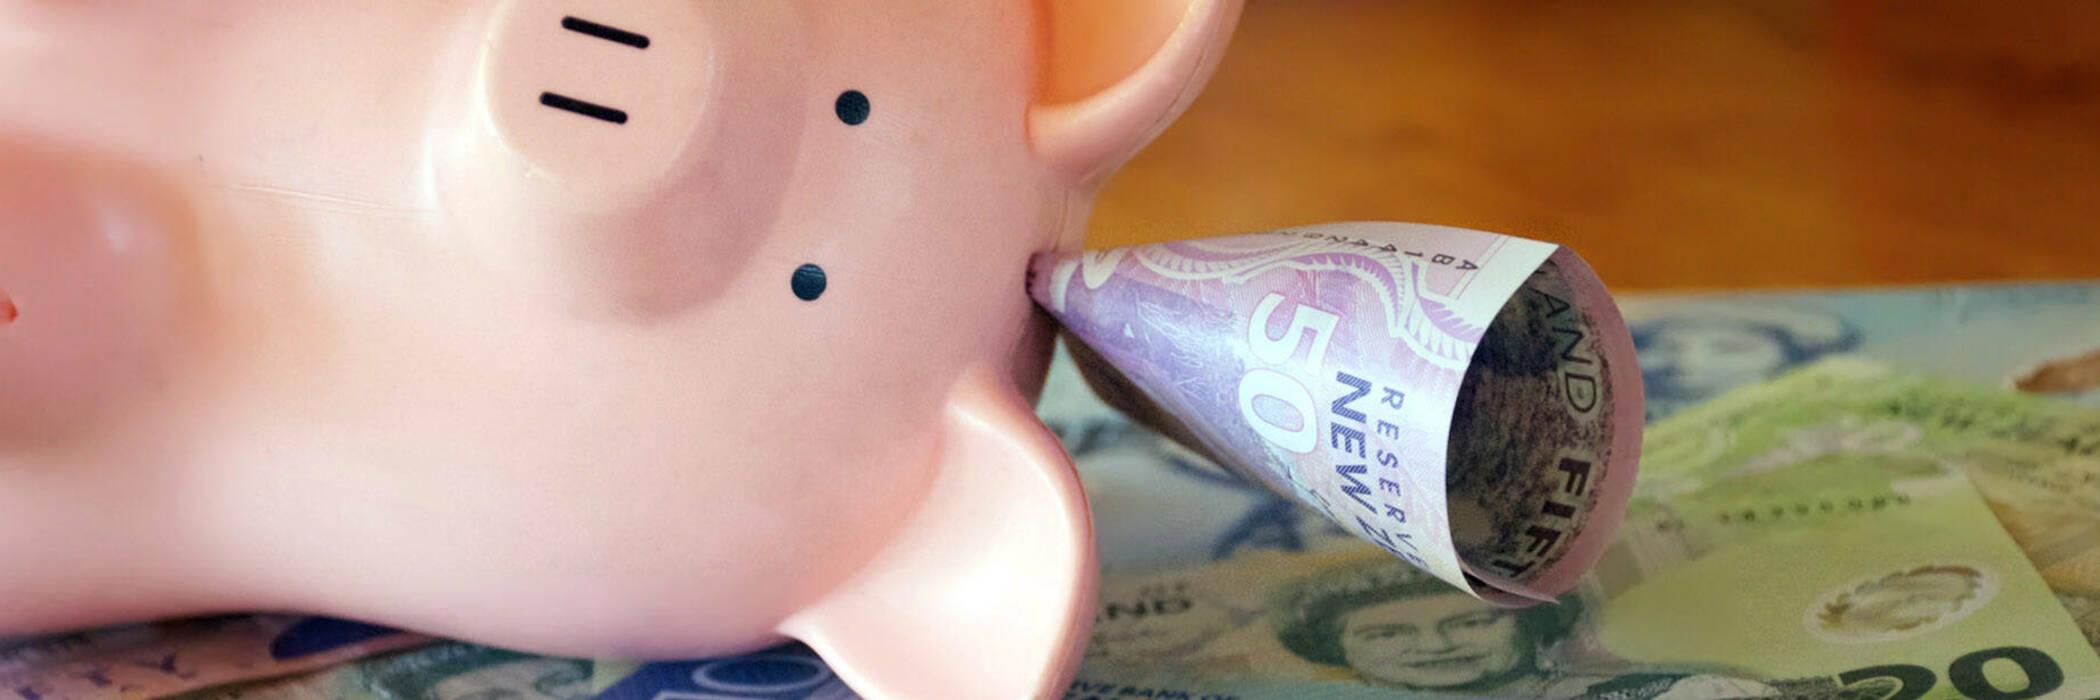 17may 100000 minimum for financial advice hero